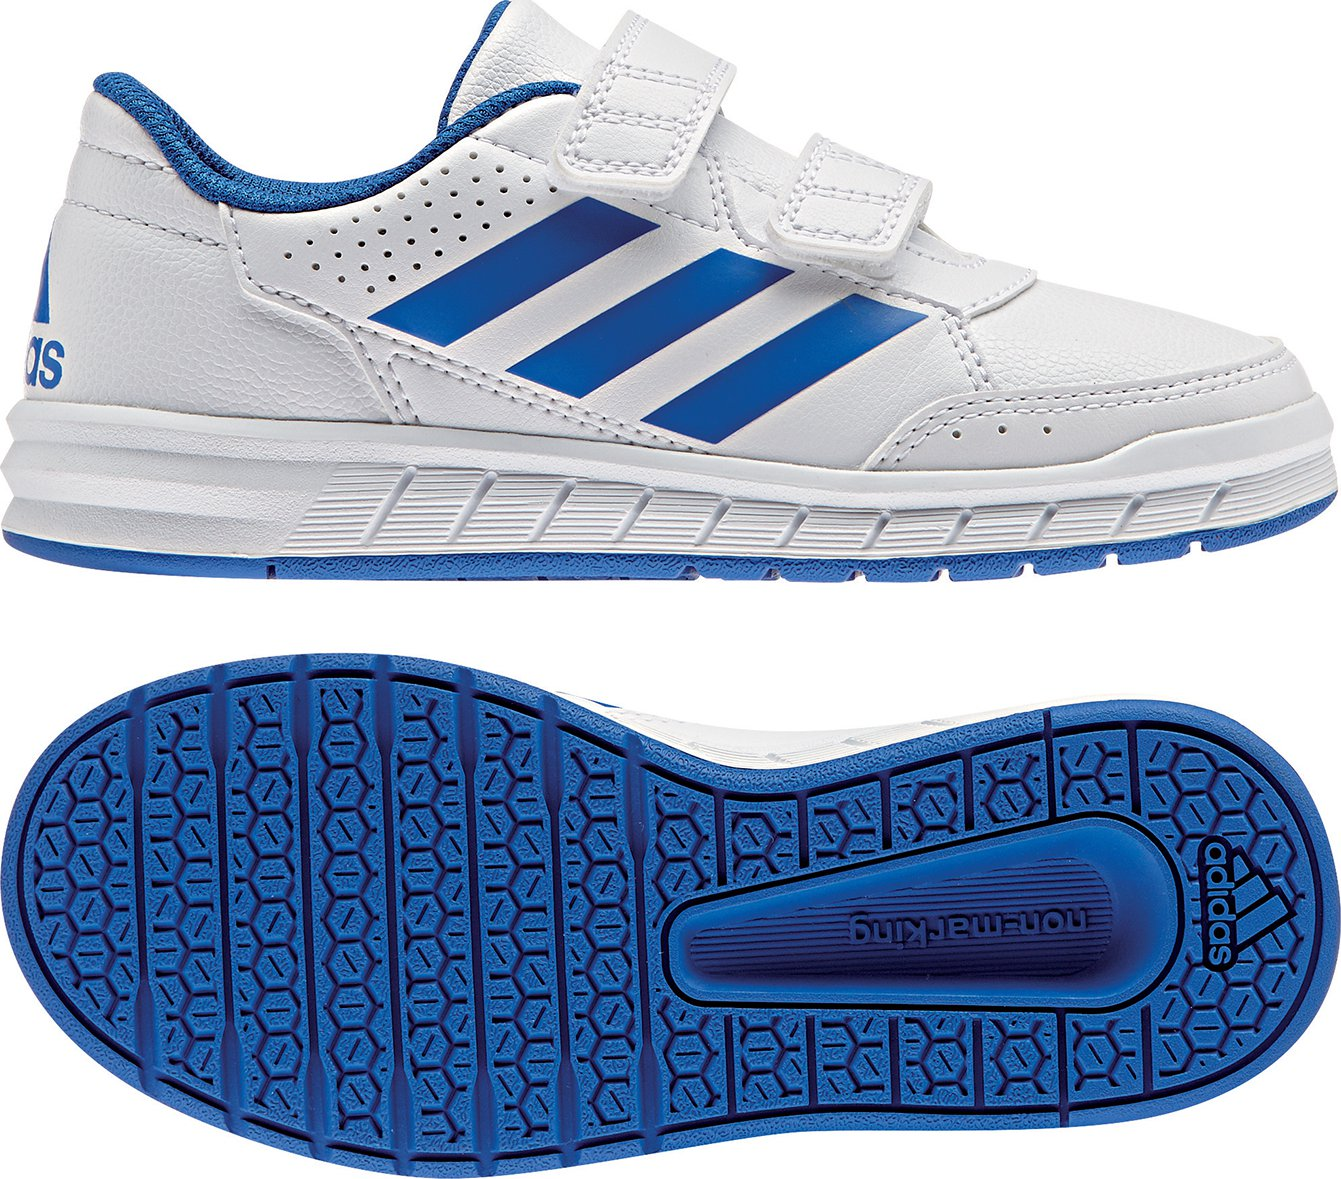 Adidas Performance AltaSport CF K bílé modré od 522 Kč • Zboží.cz 919bca8918